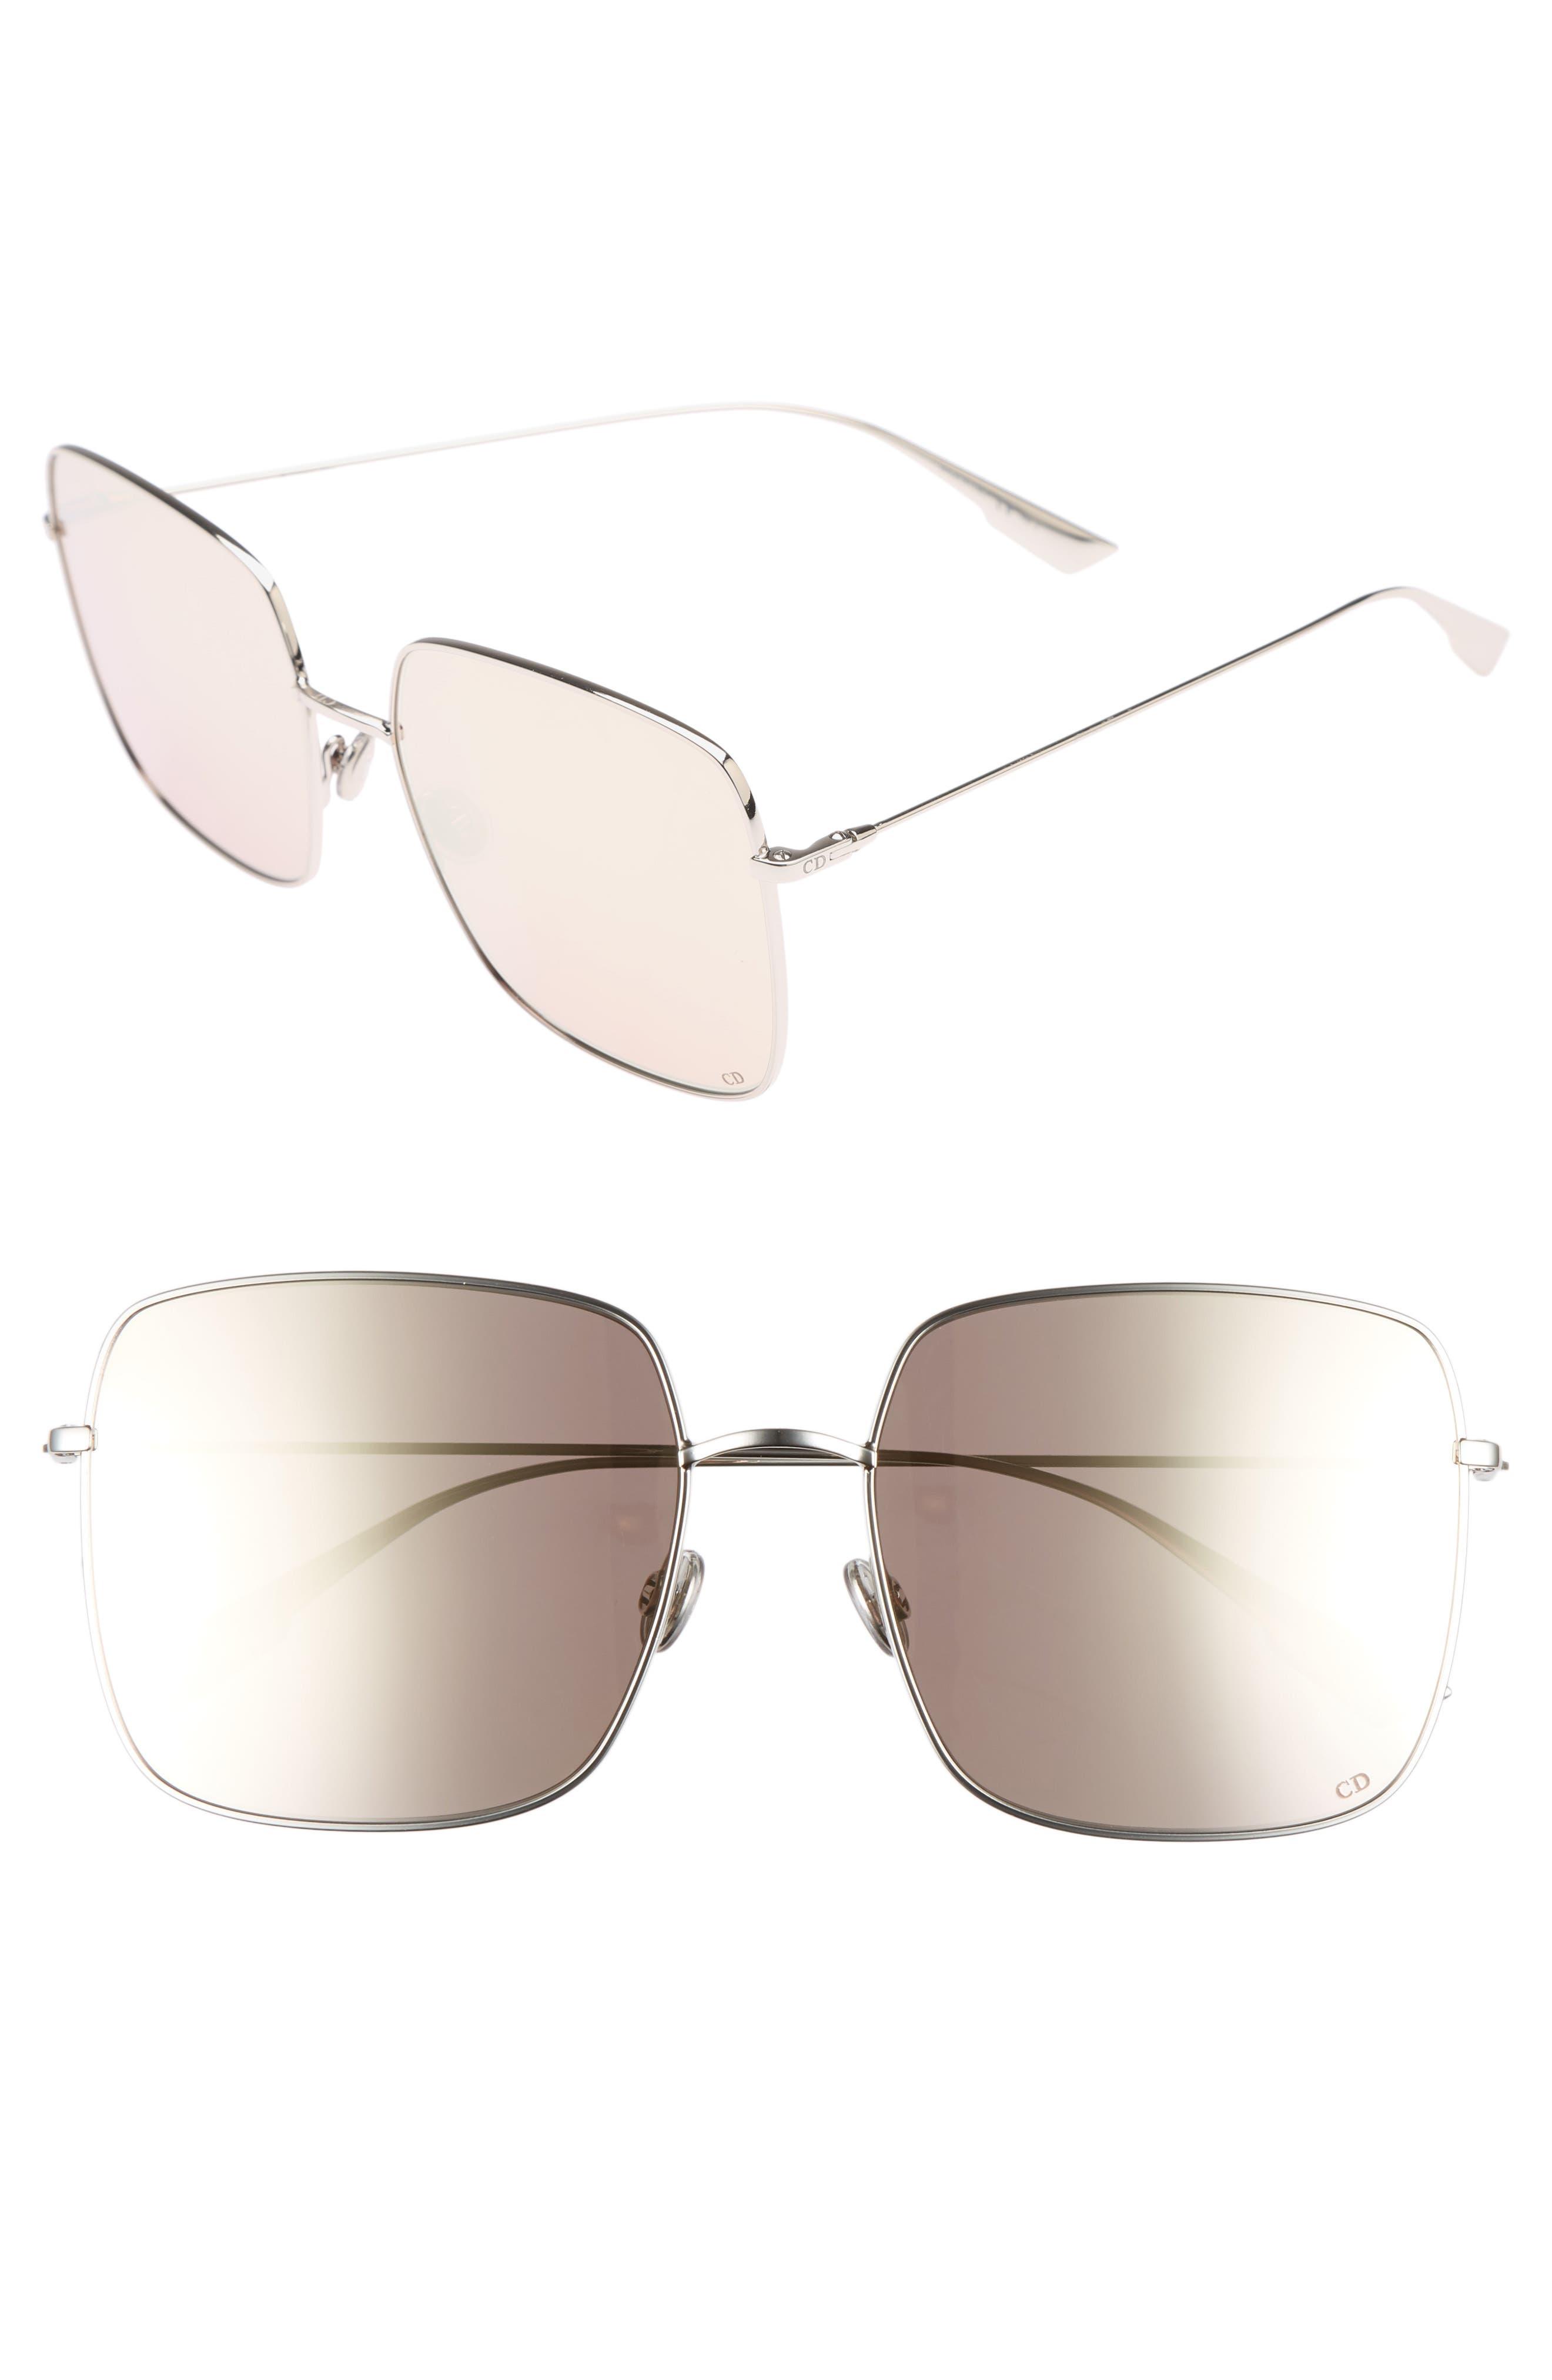 Stellaire 1 59mm Square Sunglasses,                         Main,                         color, Palladium